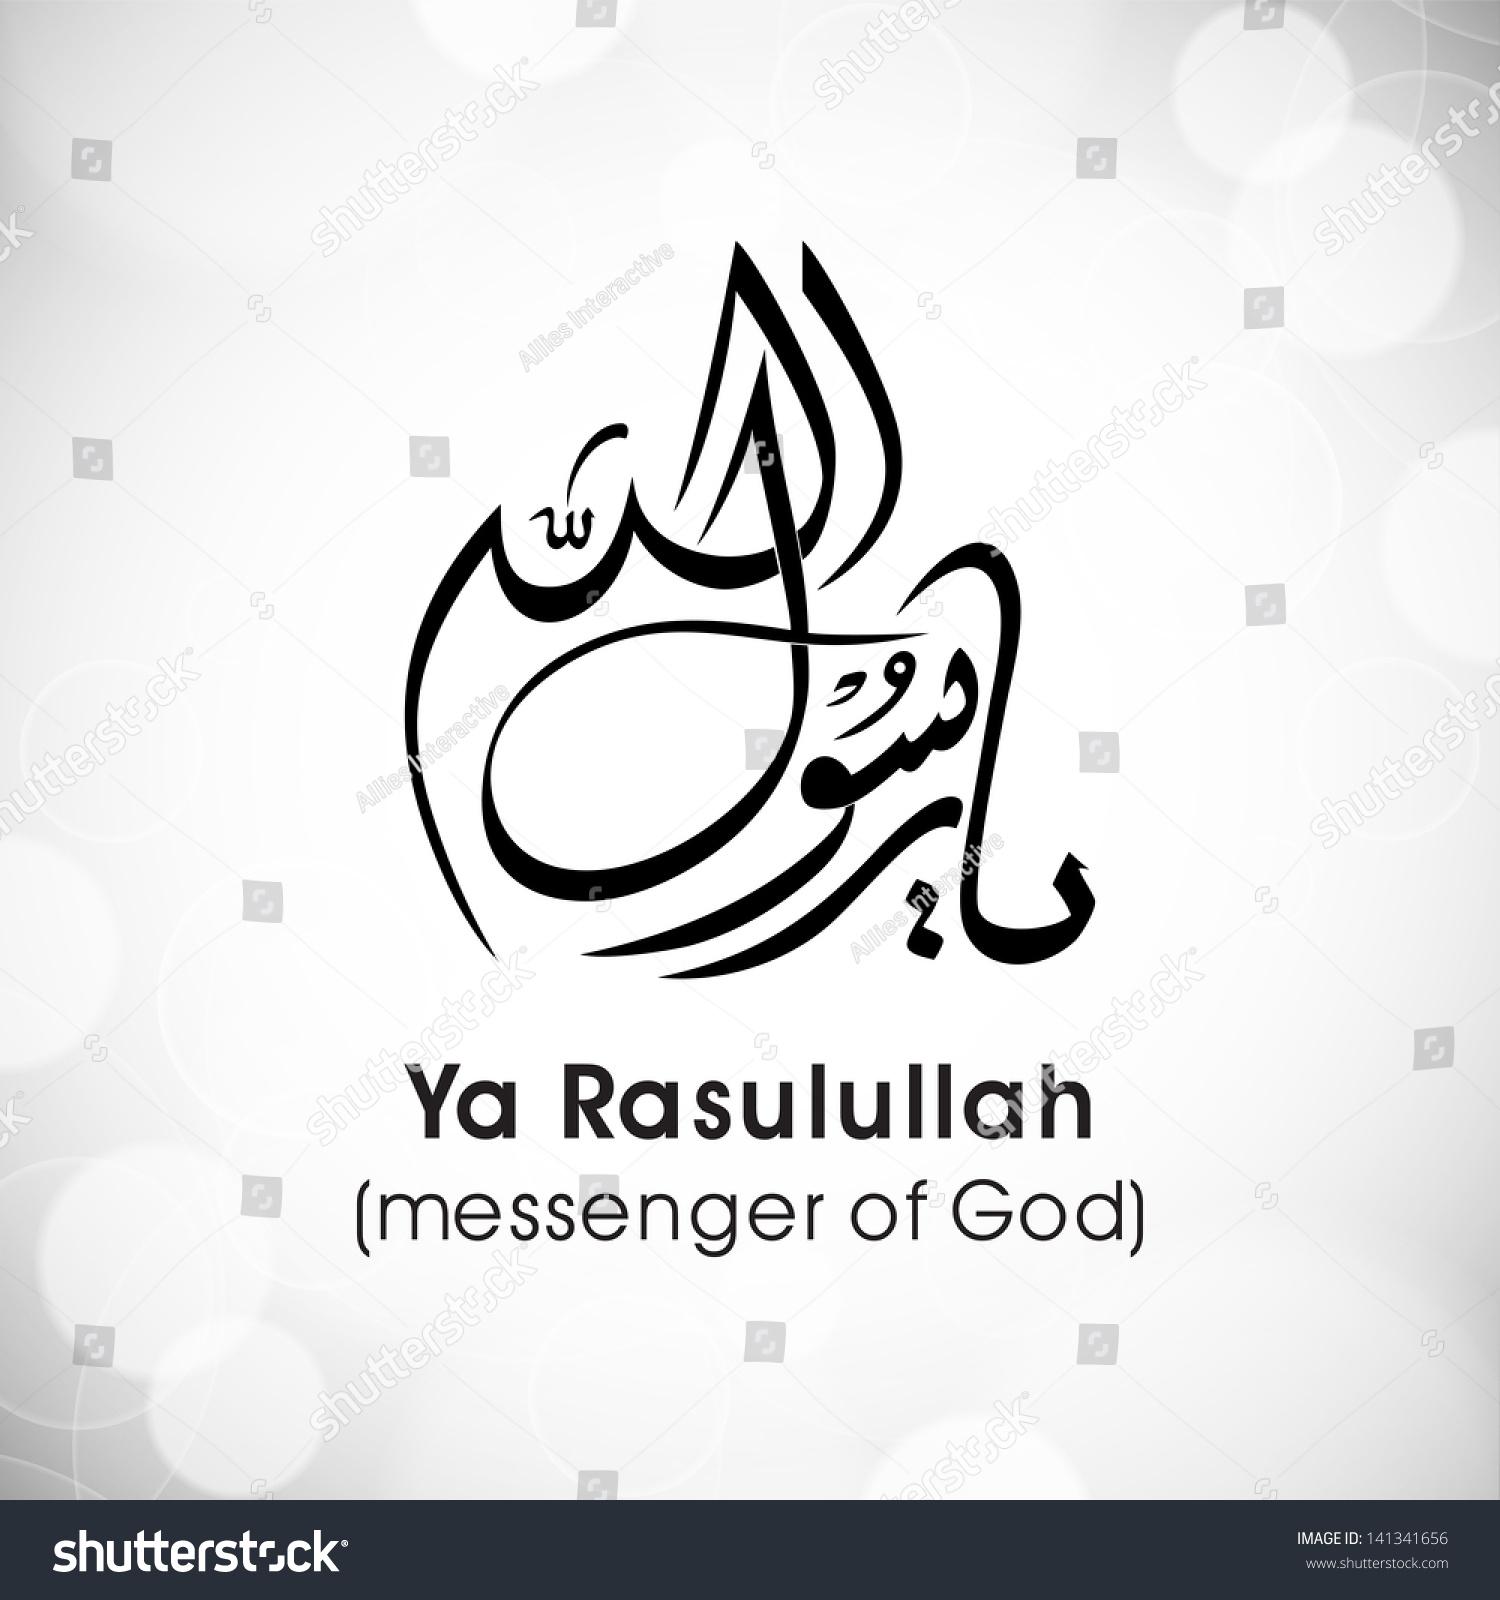 arabic islamic calligraphy duawish ya rasulullah stock vector